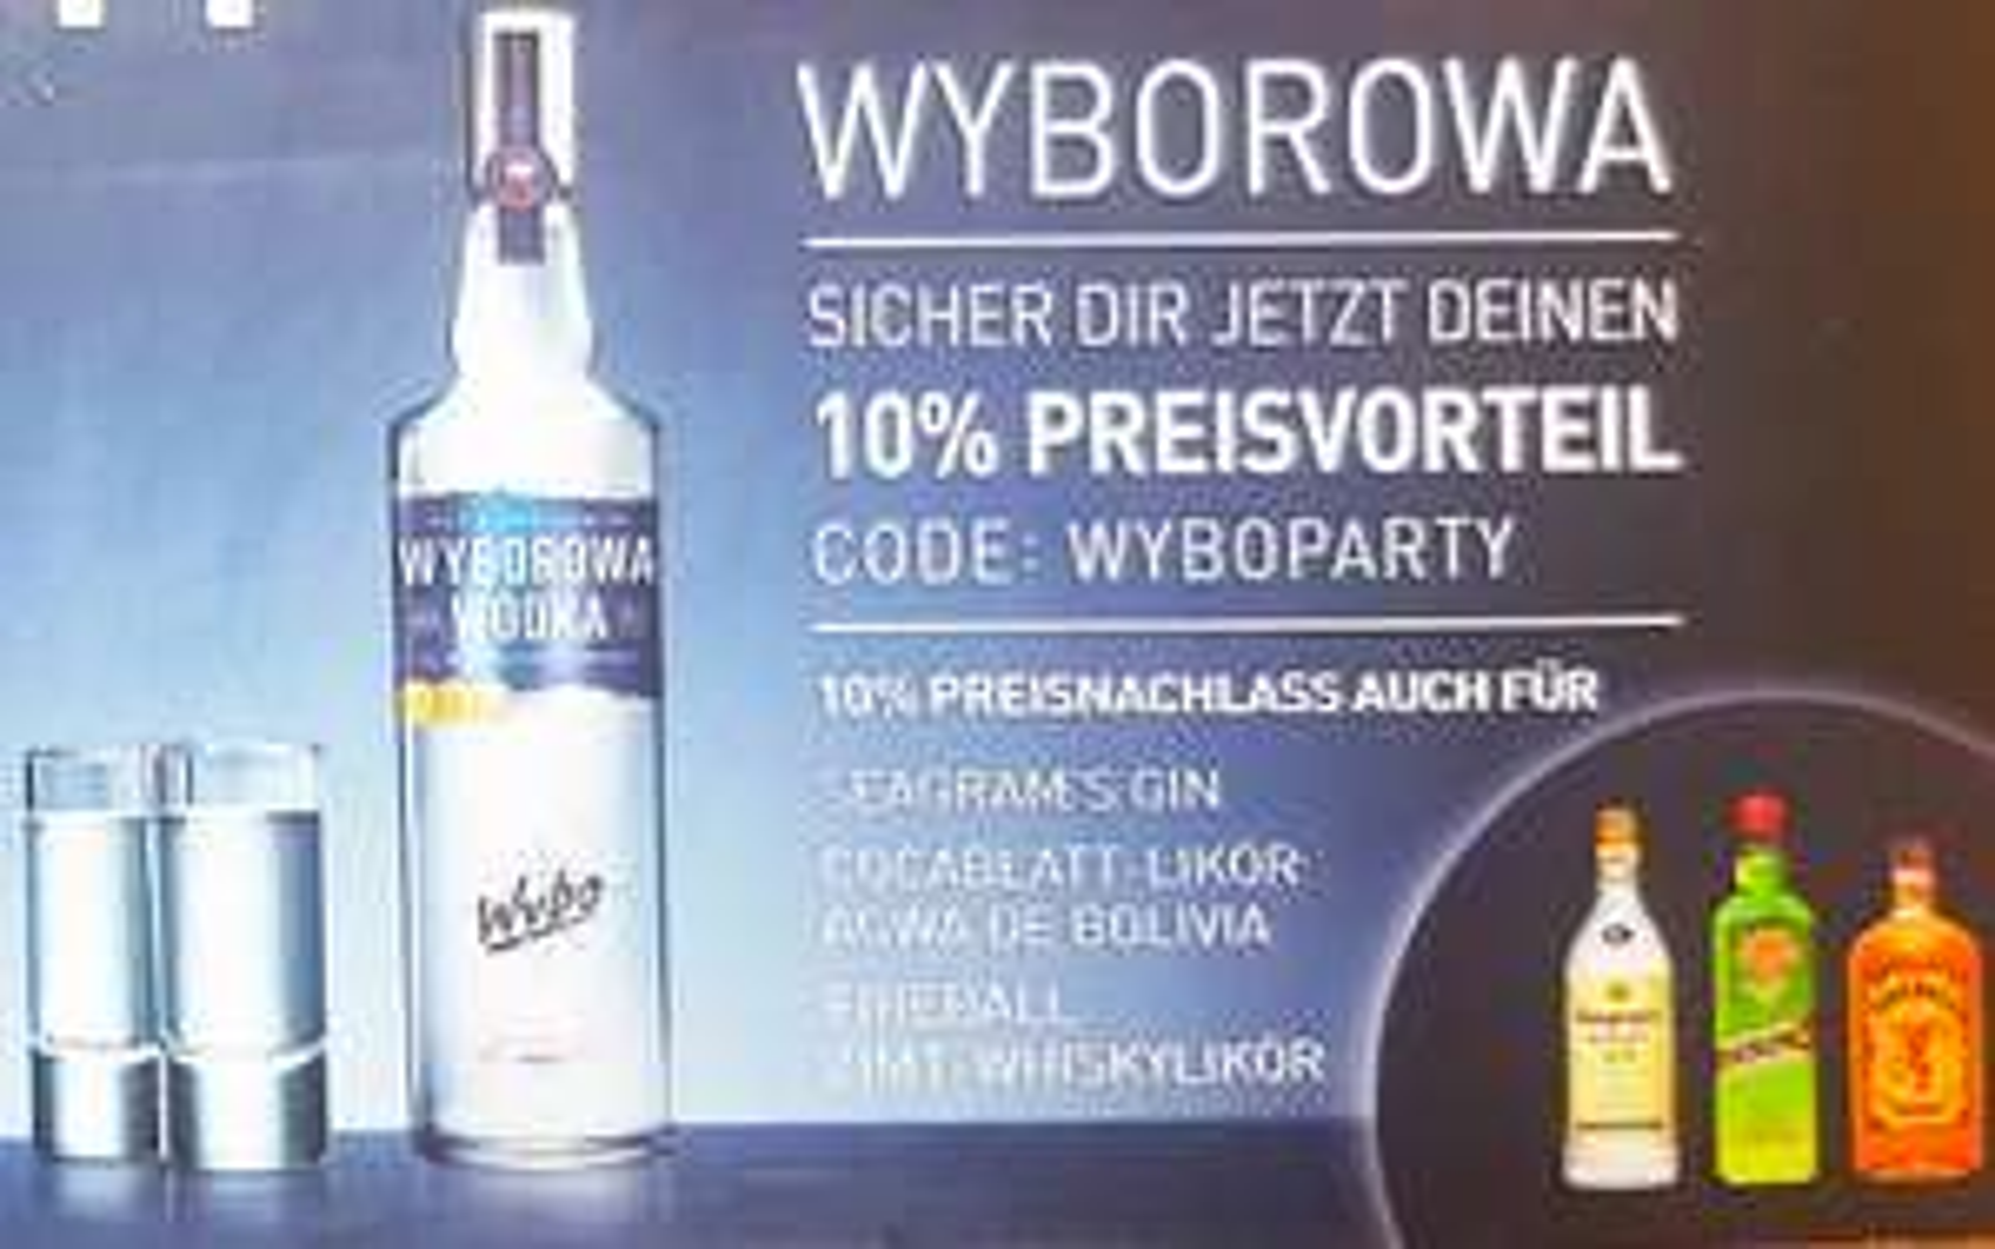 Bolou Rabattcode für WYBO SEAGRAMS FIREBALL AGWA ...